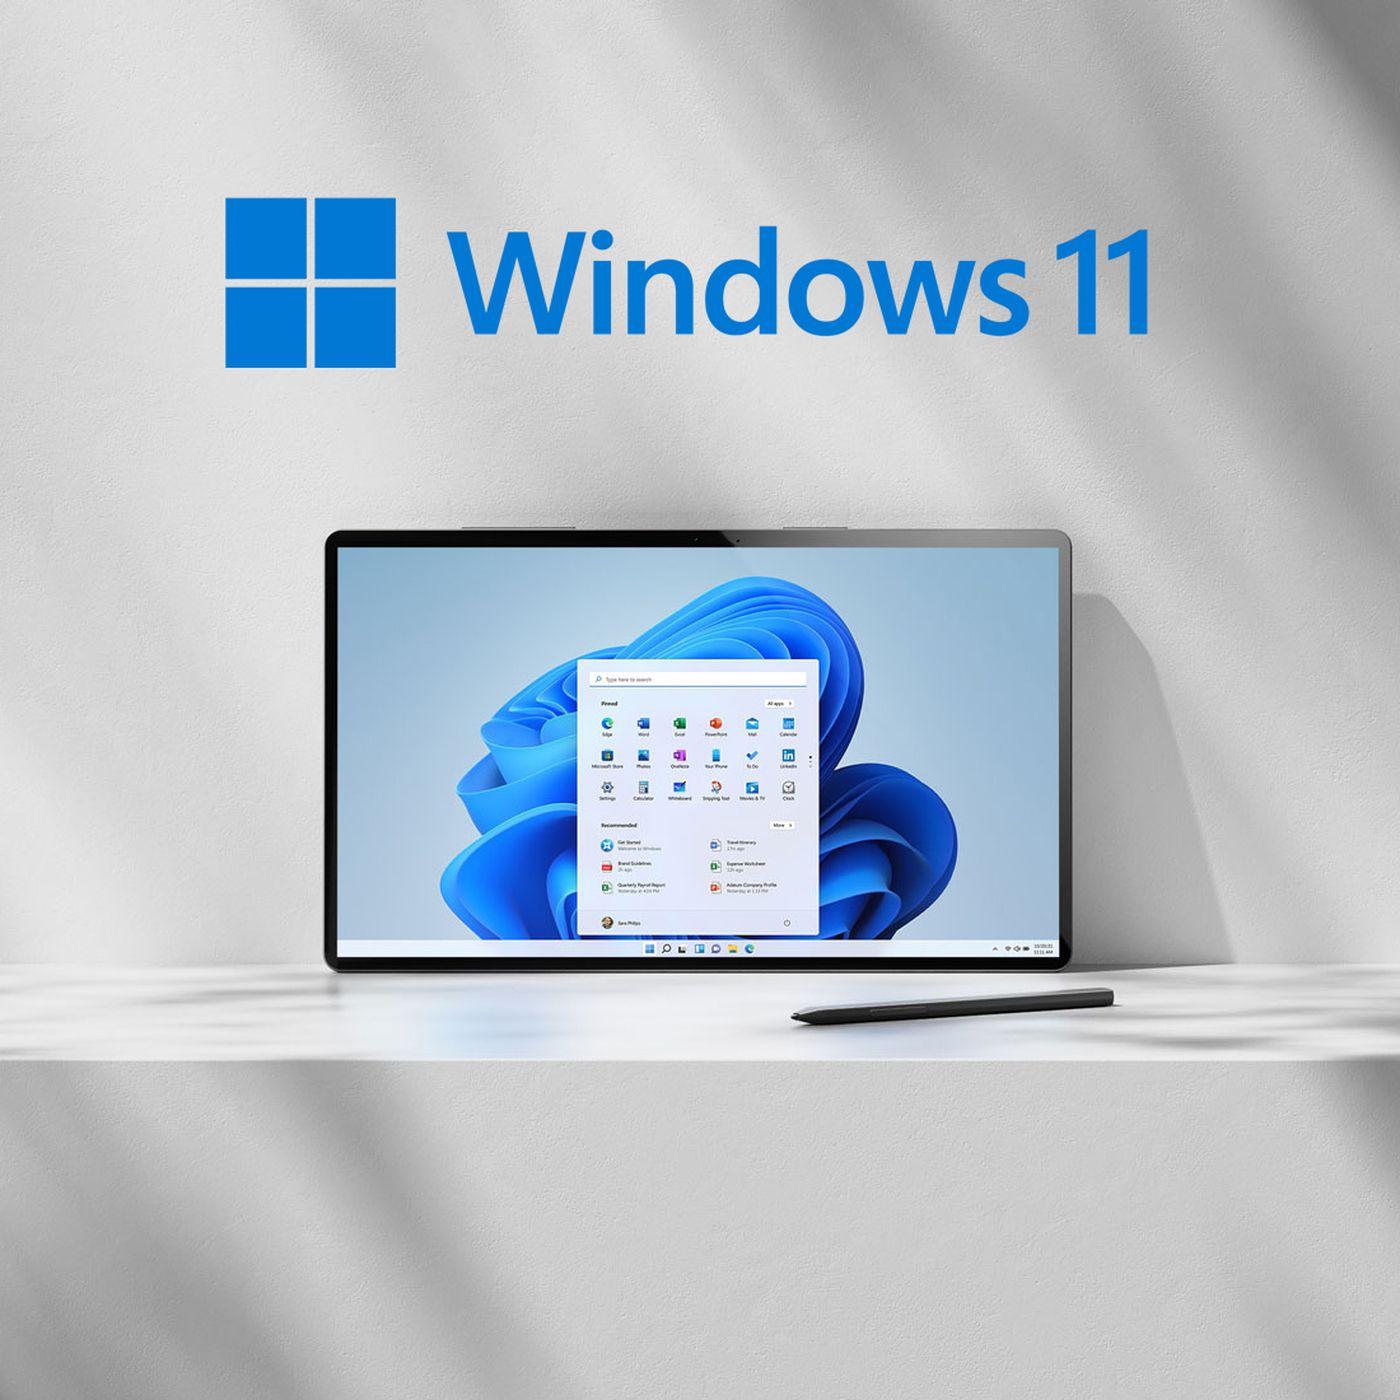 Microsoft won't stop you installing Windows 11 on older PCs - The Verge